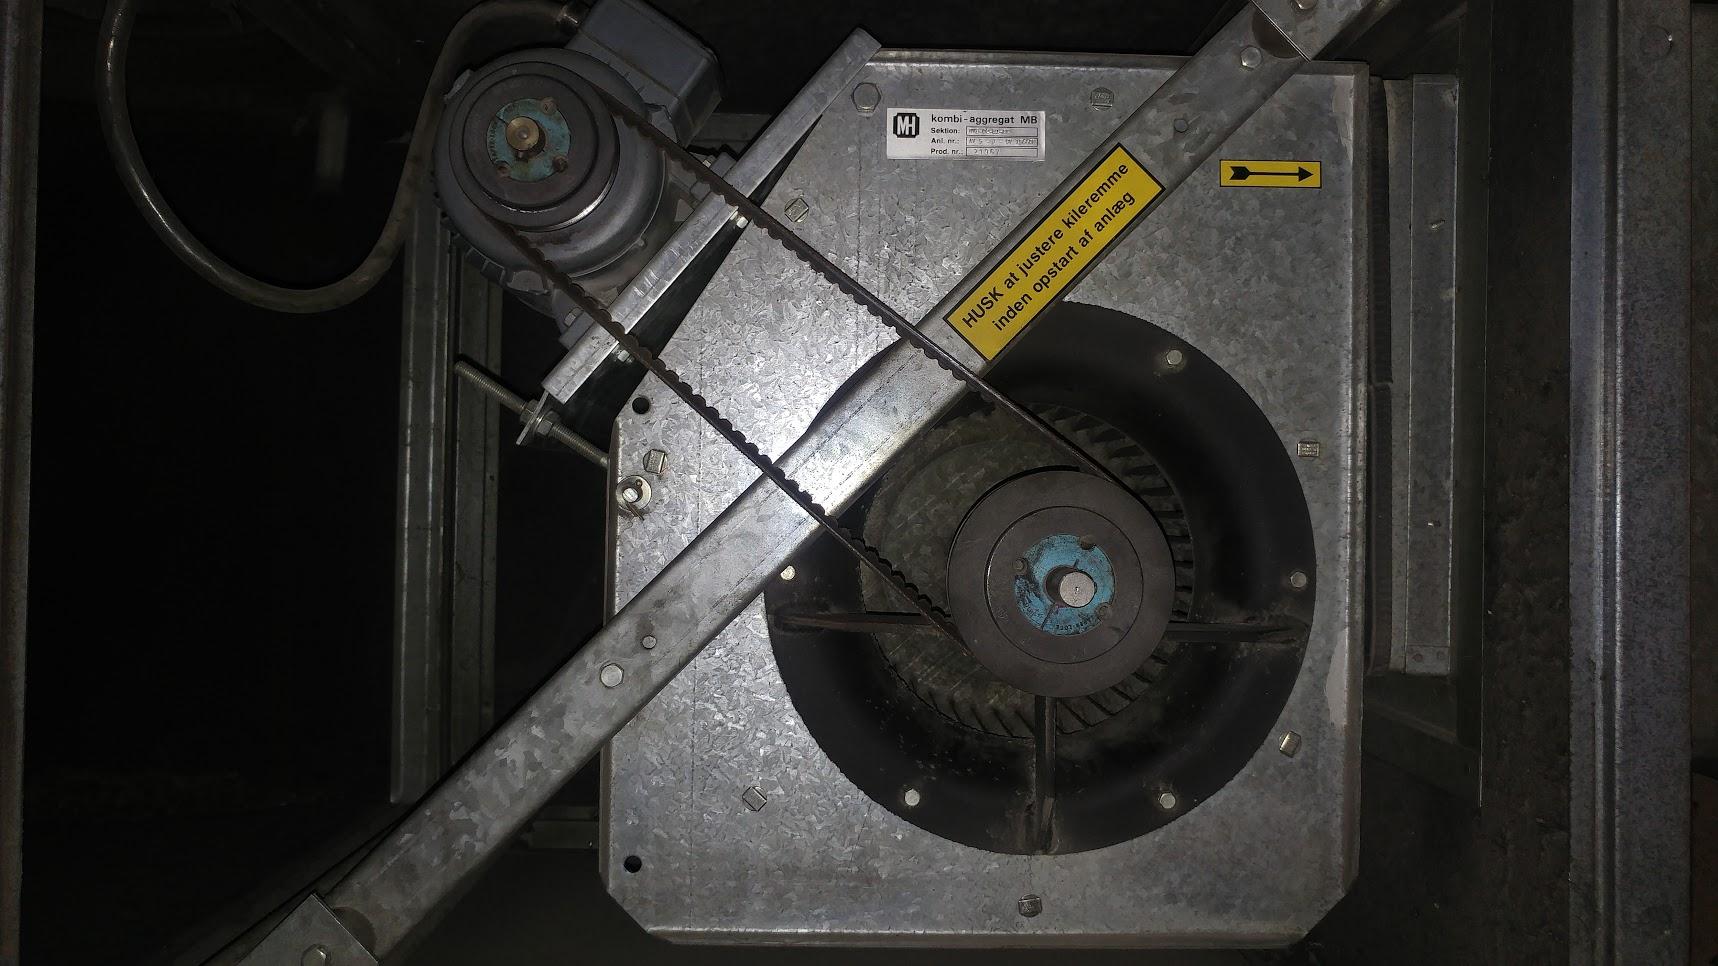 Verksgata, Ventilasjon - Utskifting ventilasjonsaggregat